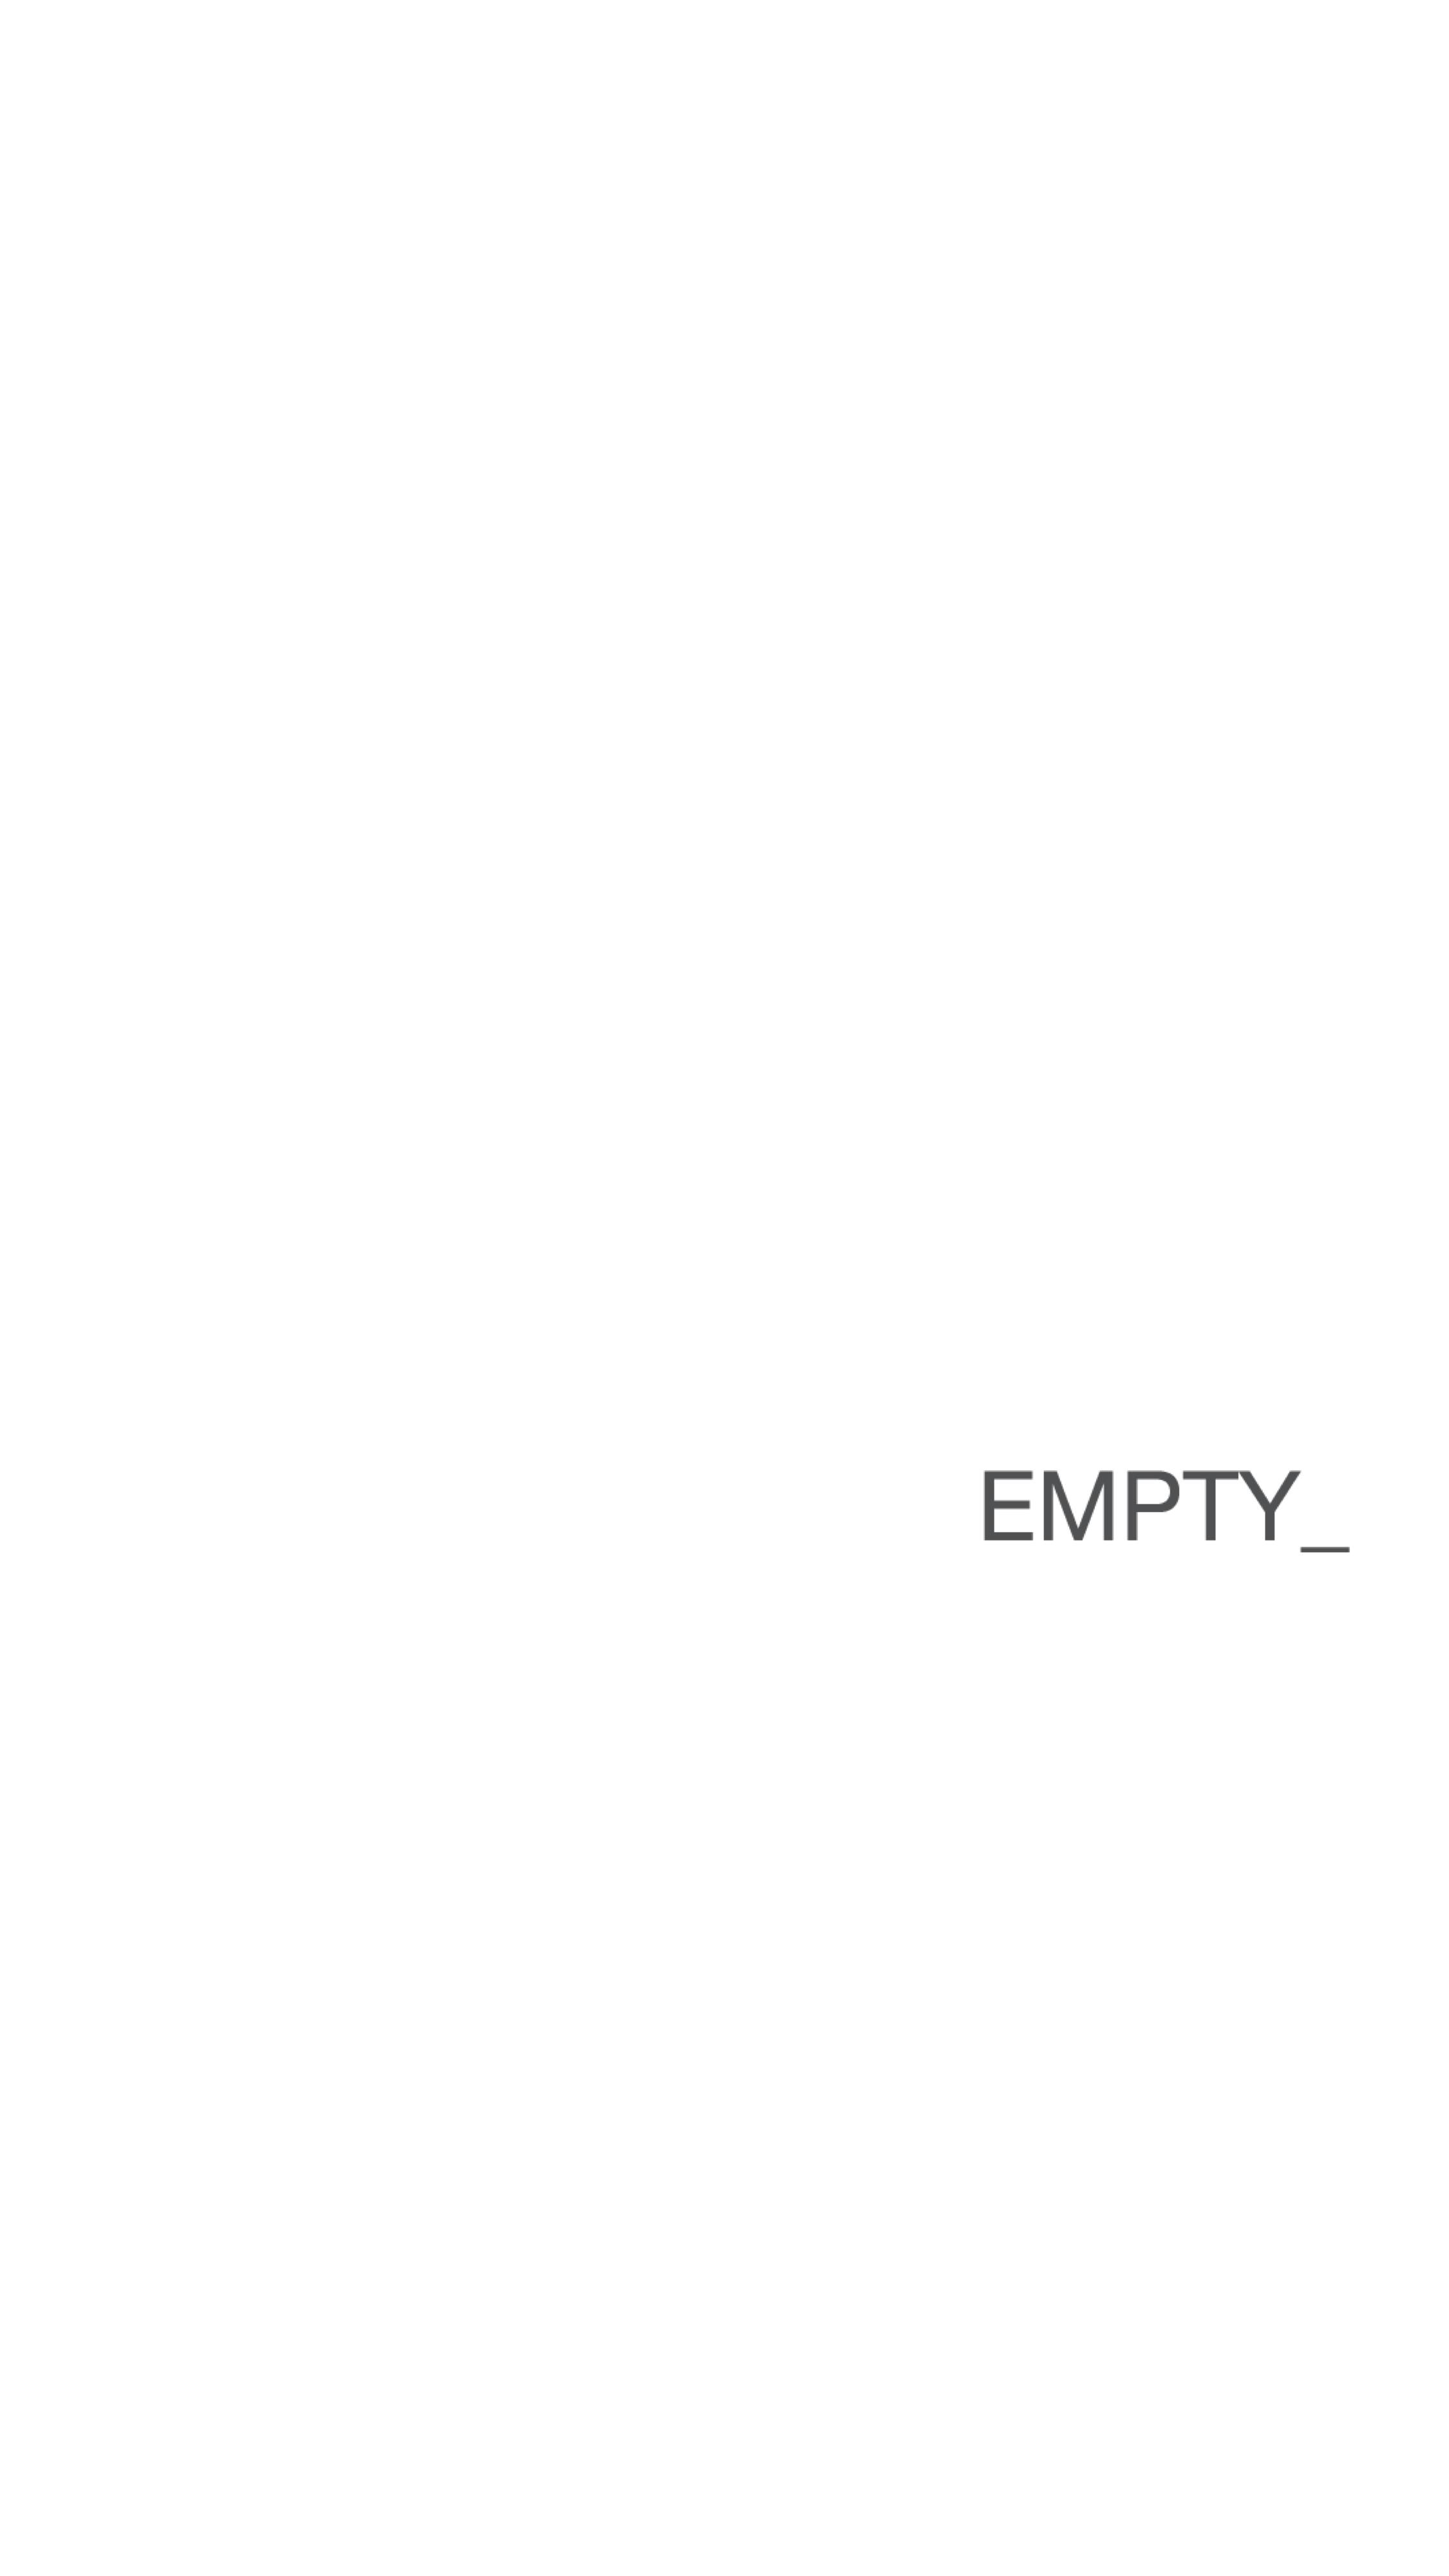 EMPTY_WEBJPG.JPG